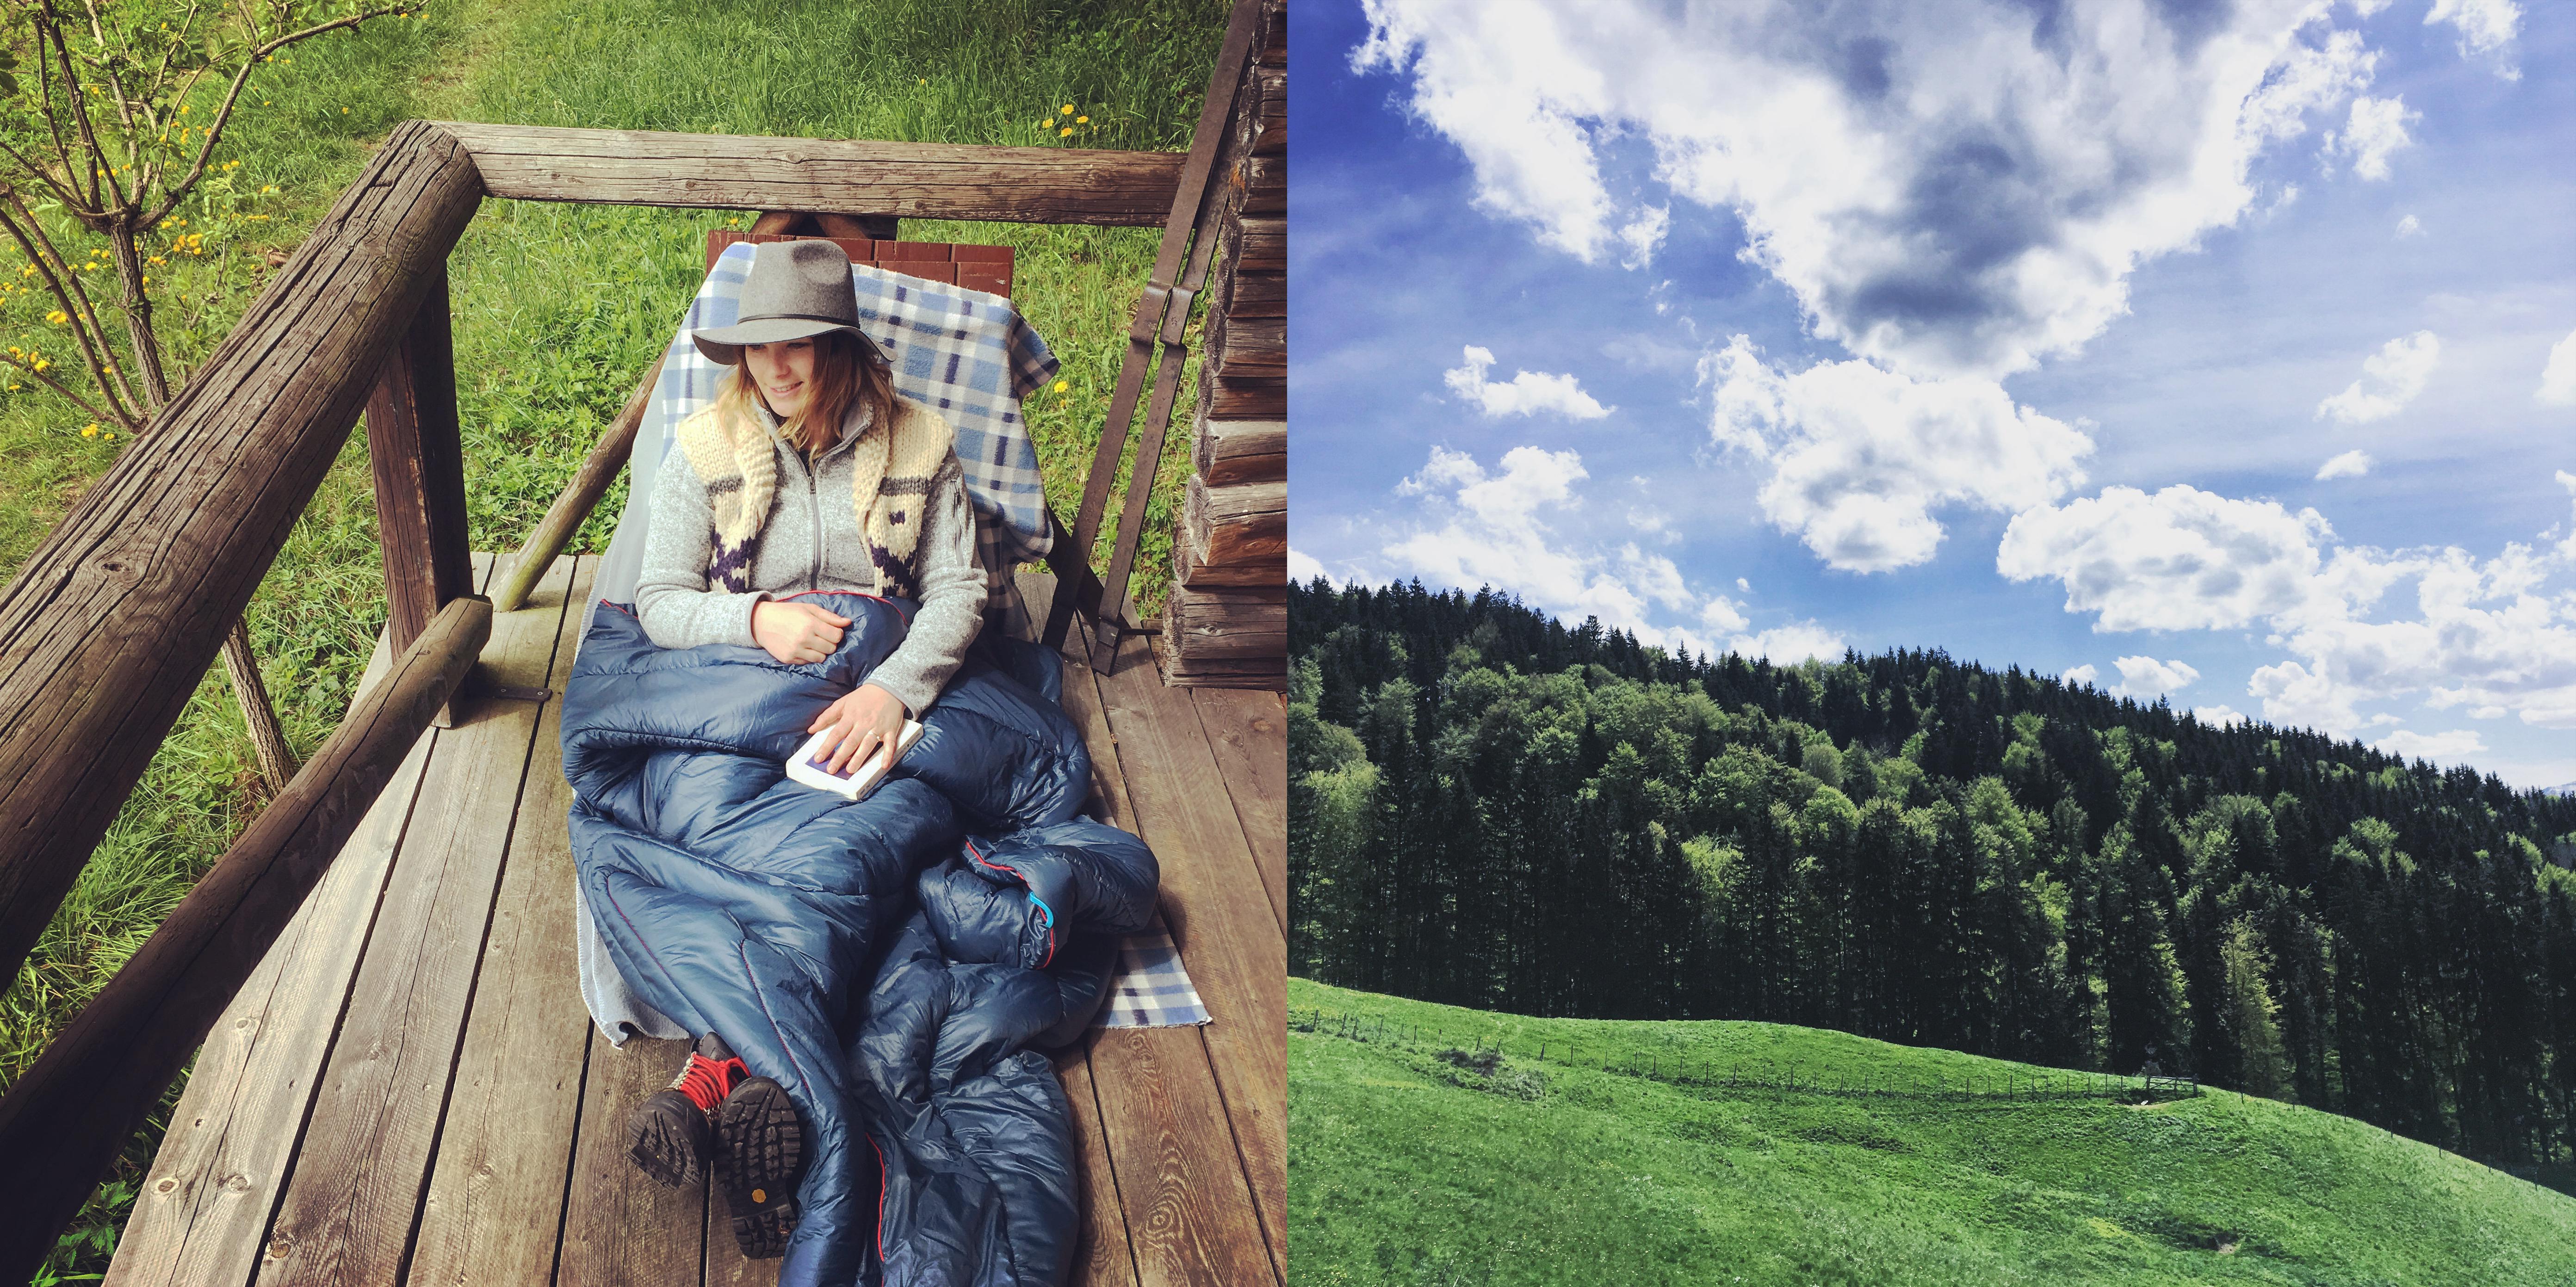 maybeyoulike_cabin_woods1